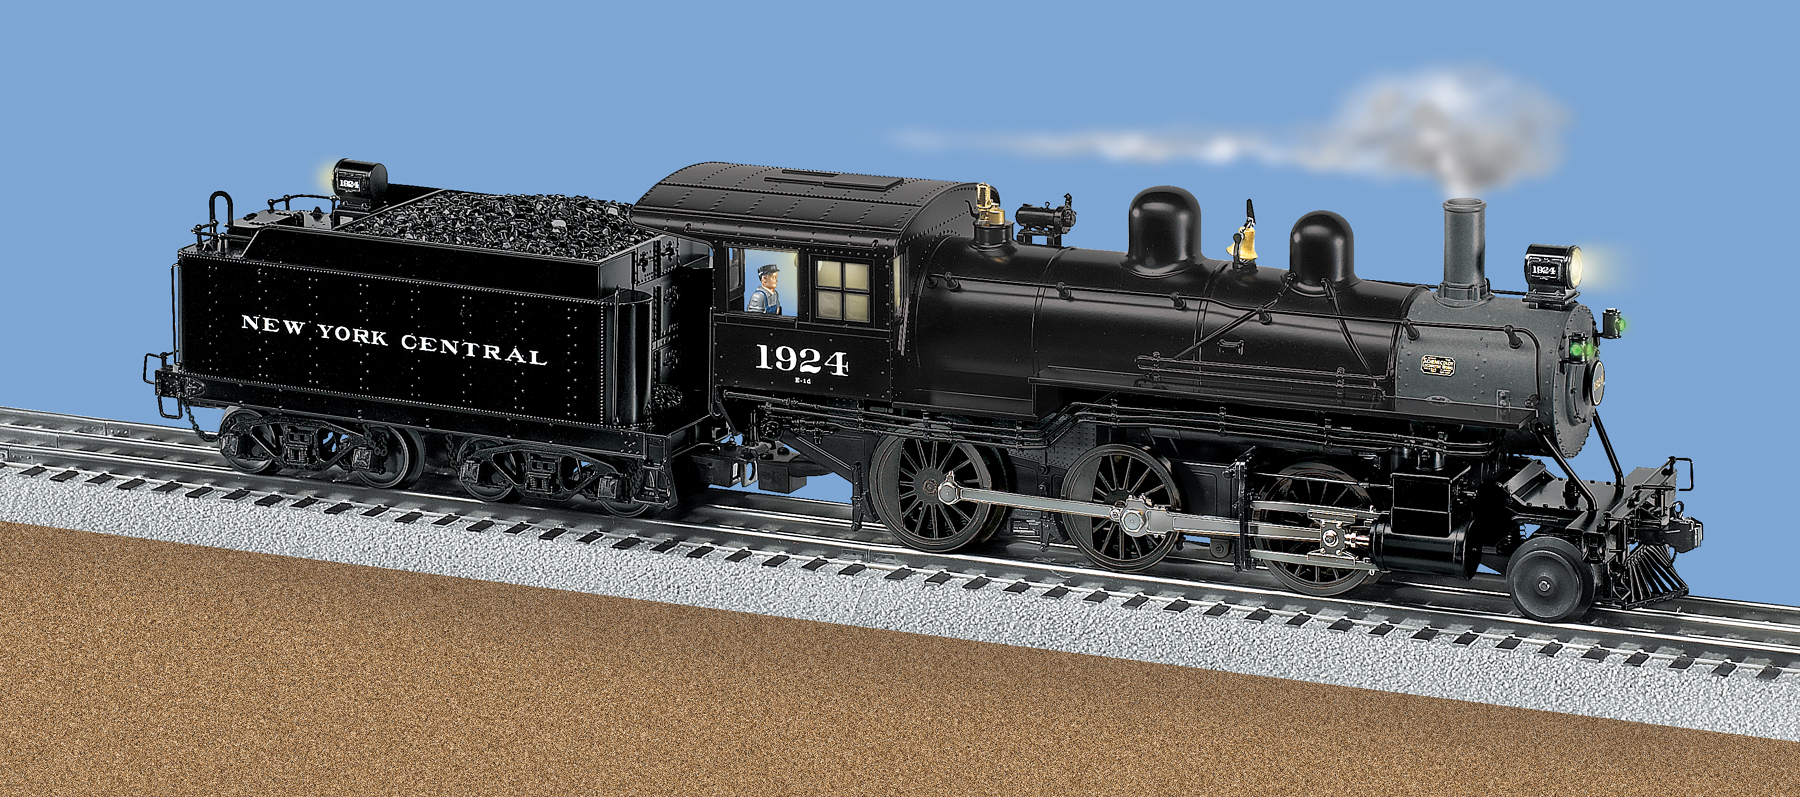 new york central tmcc scale 2 6 0 mogul steam locomotive 1924 rh lionel com lionel lionel locomotive wiring diagram  [ 1800 x 797 Pixel ]